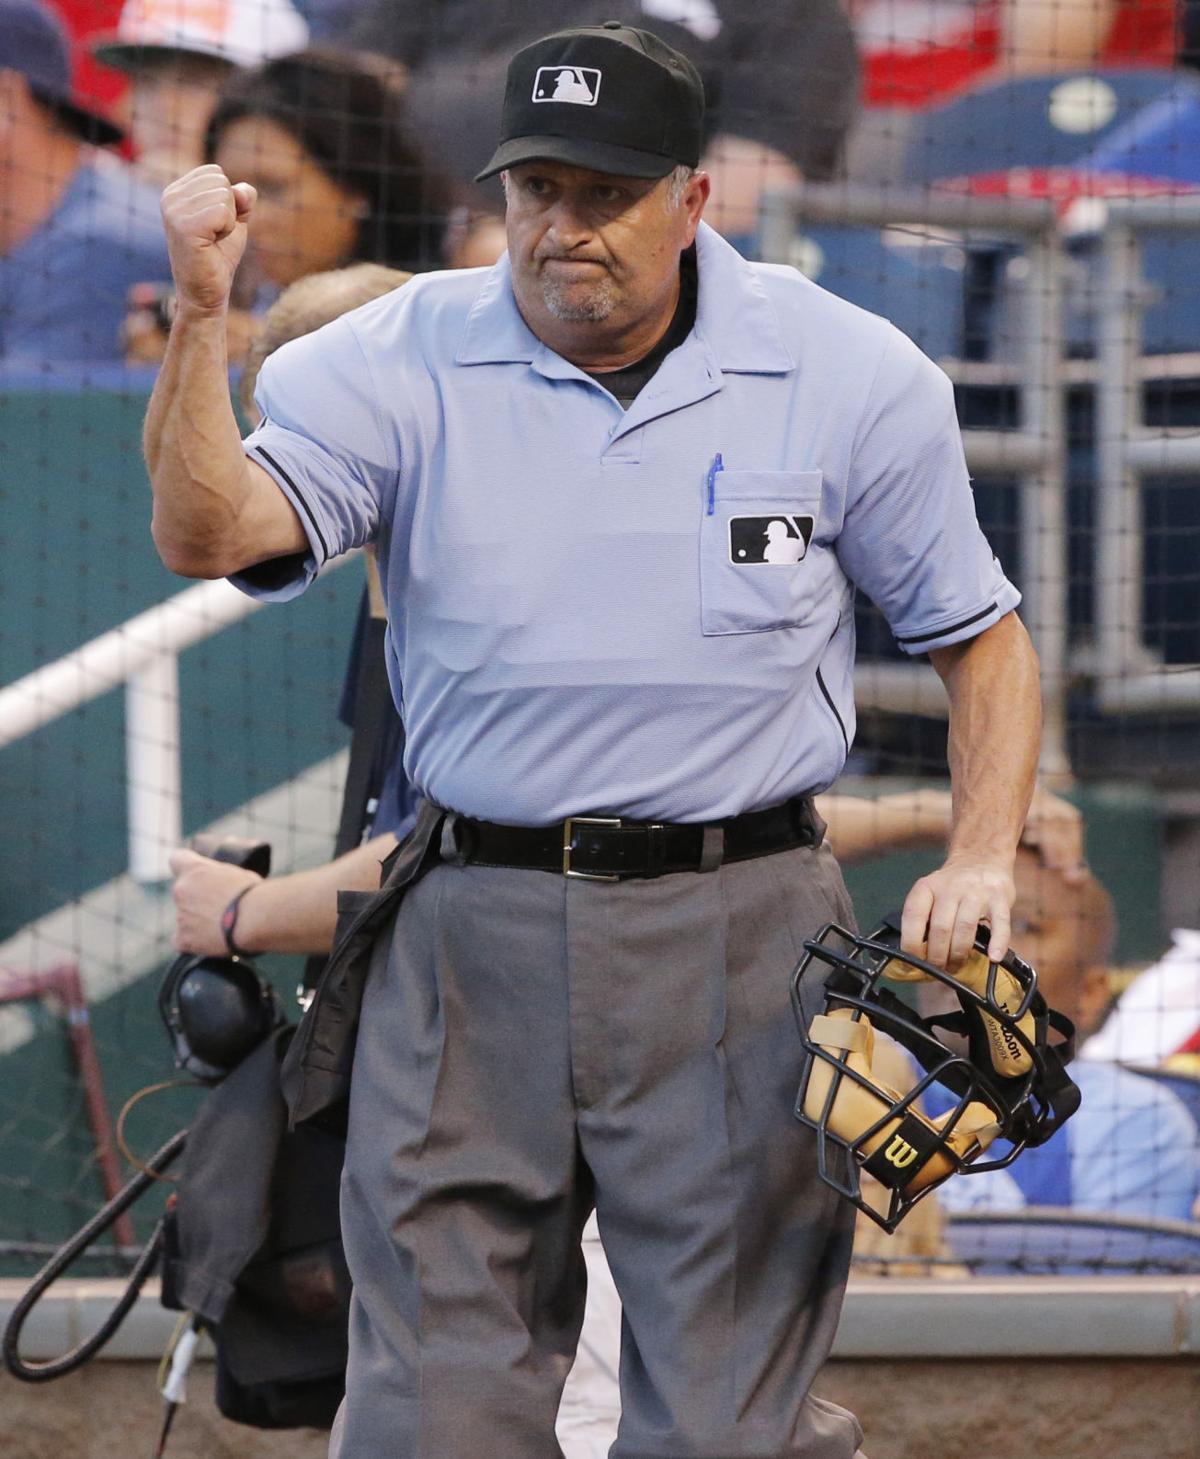 Major League Baseball umpire comes out as gay  3694775623d